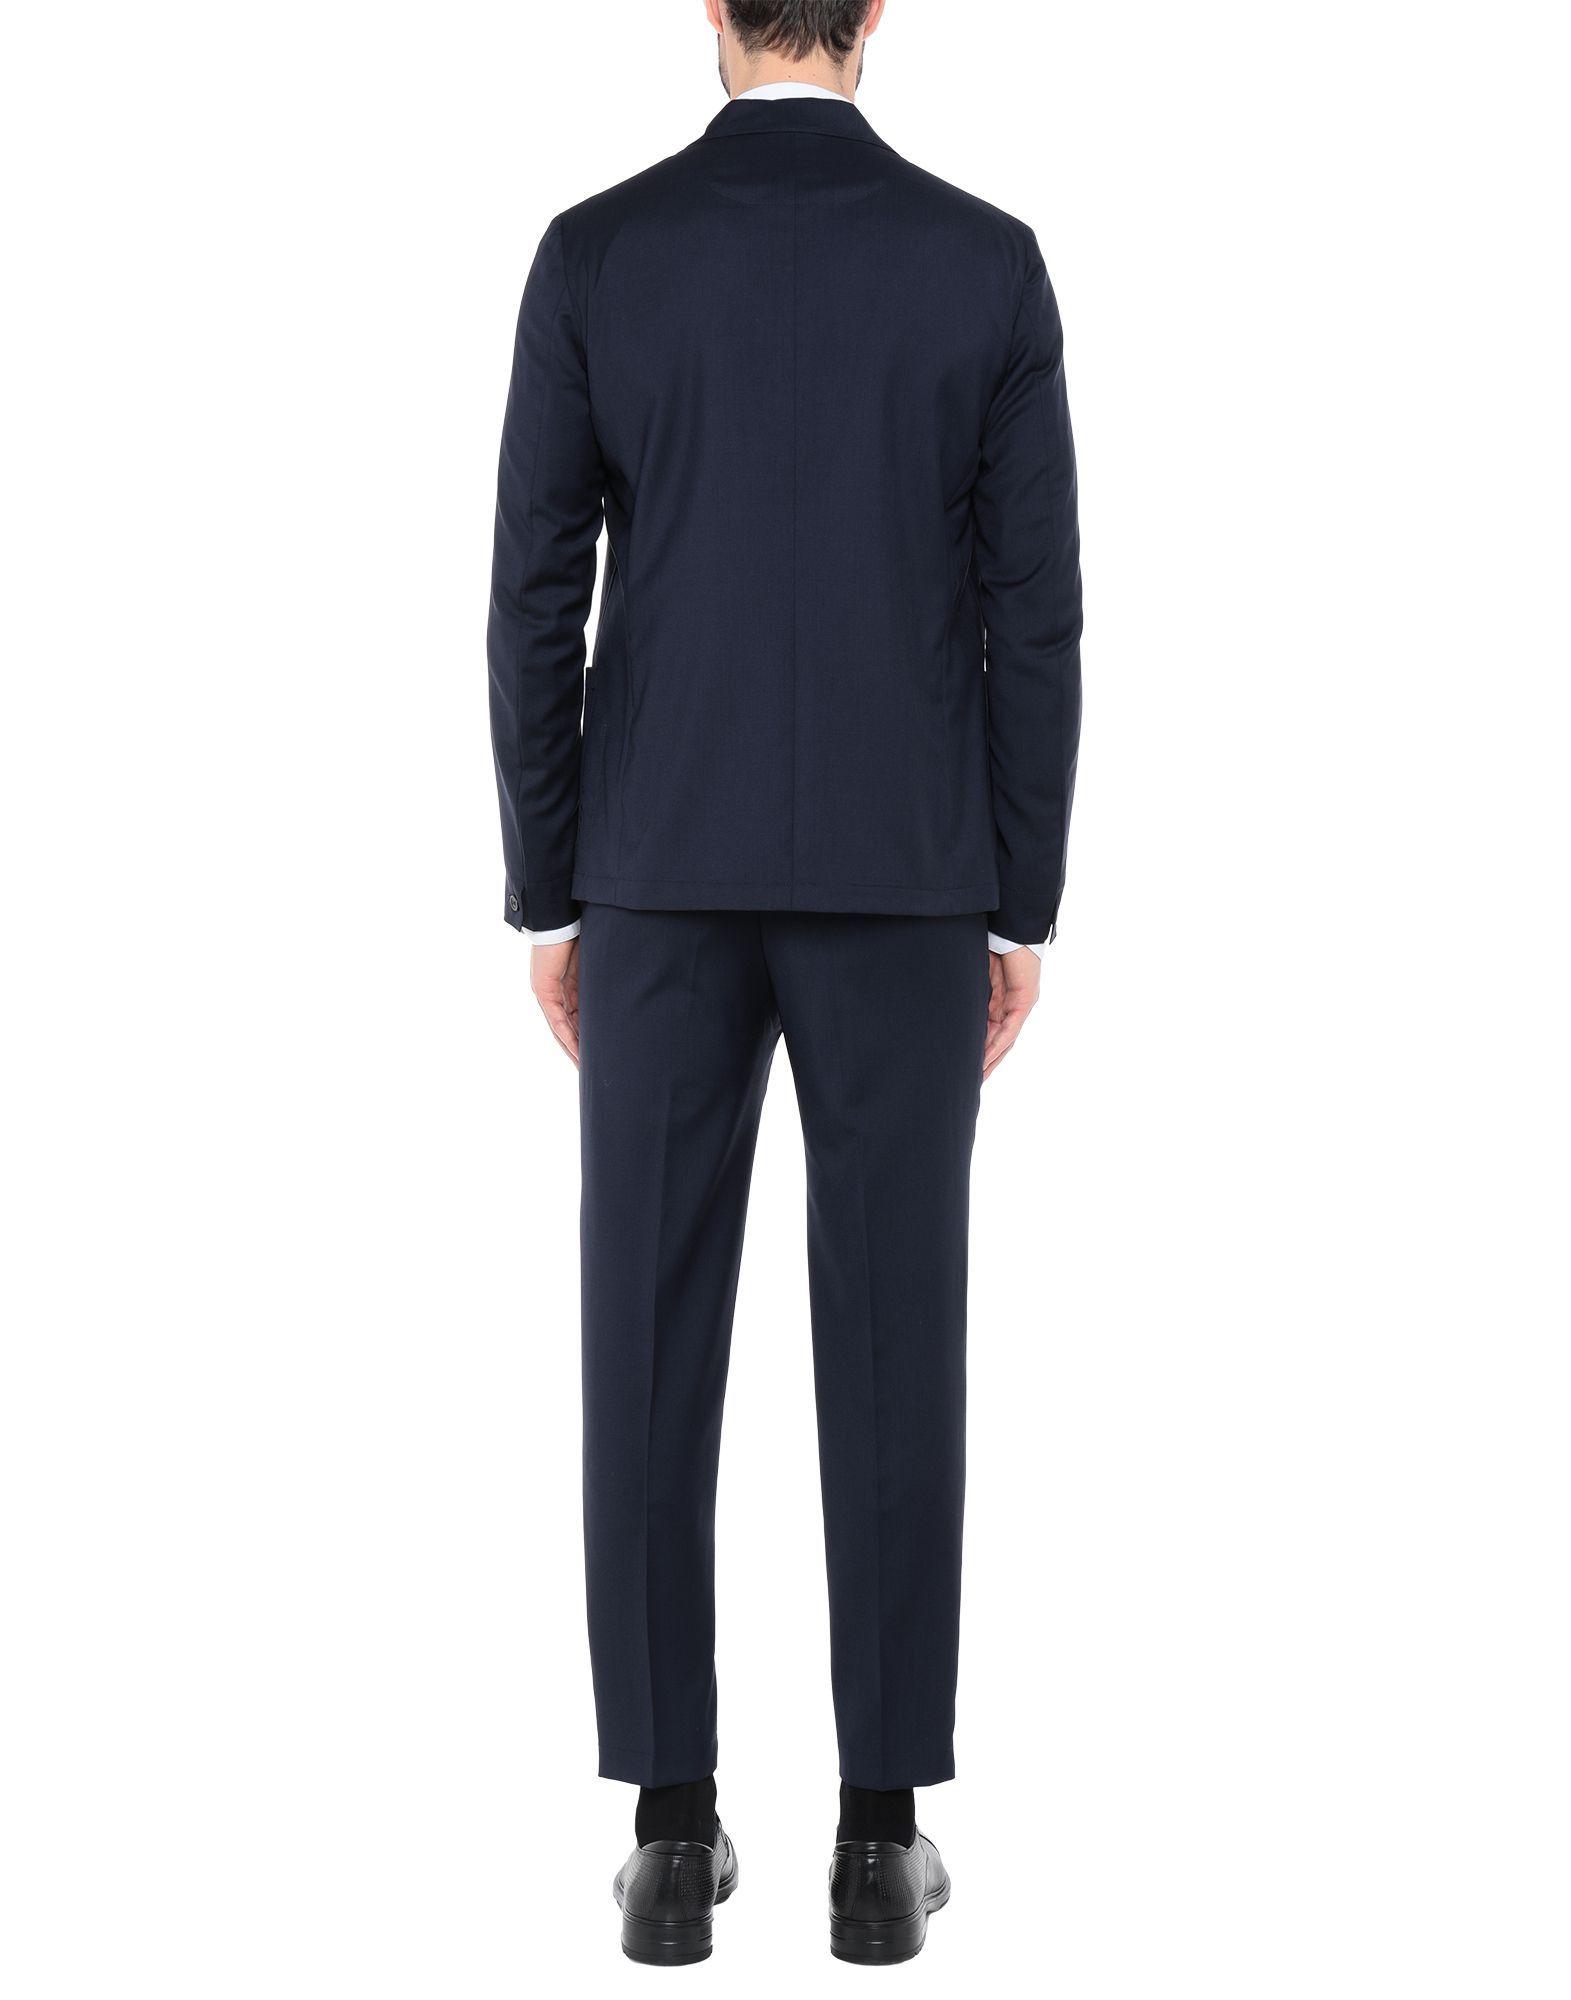 Mauro Grifoni Dark Blue Virgin Wool Single Breasted Suit